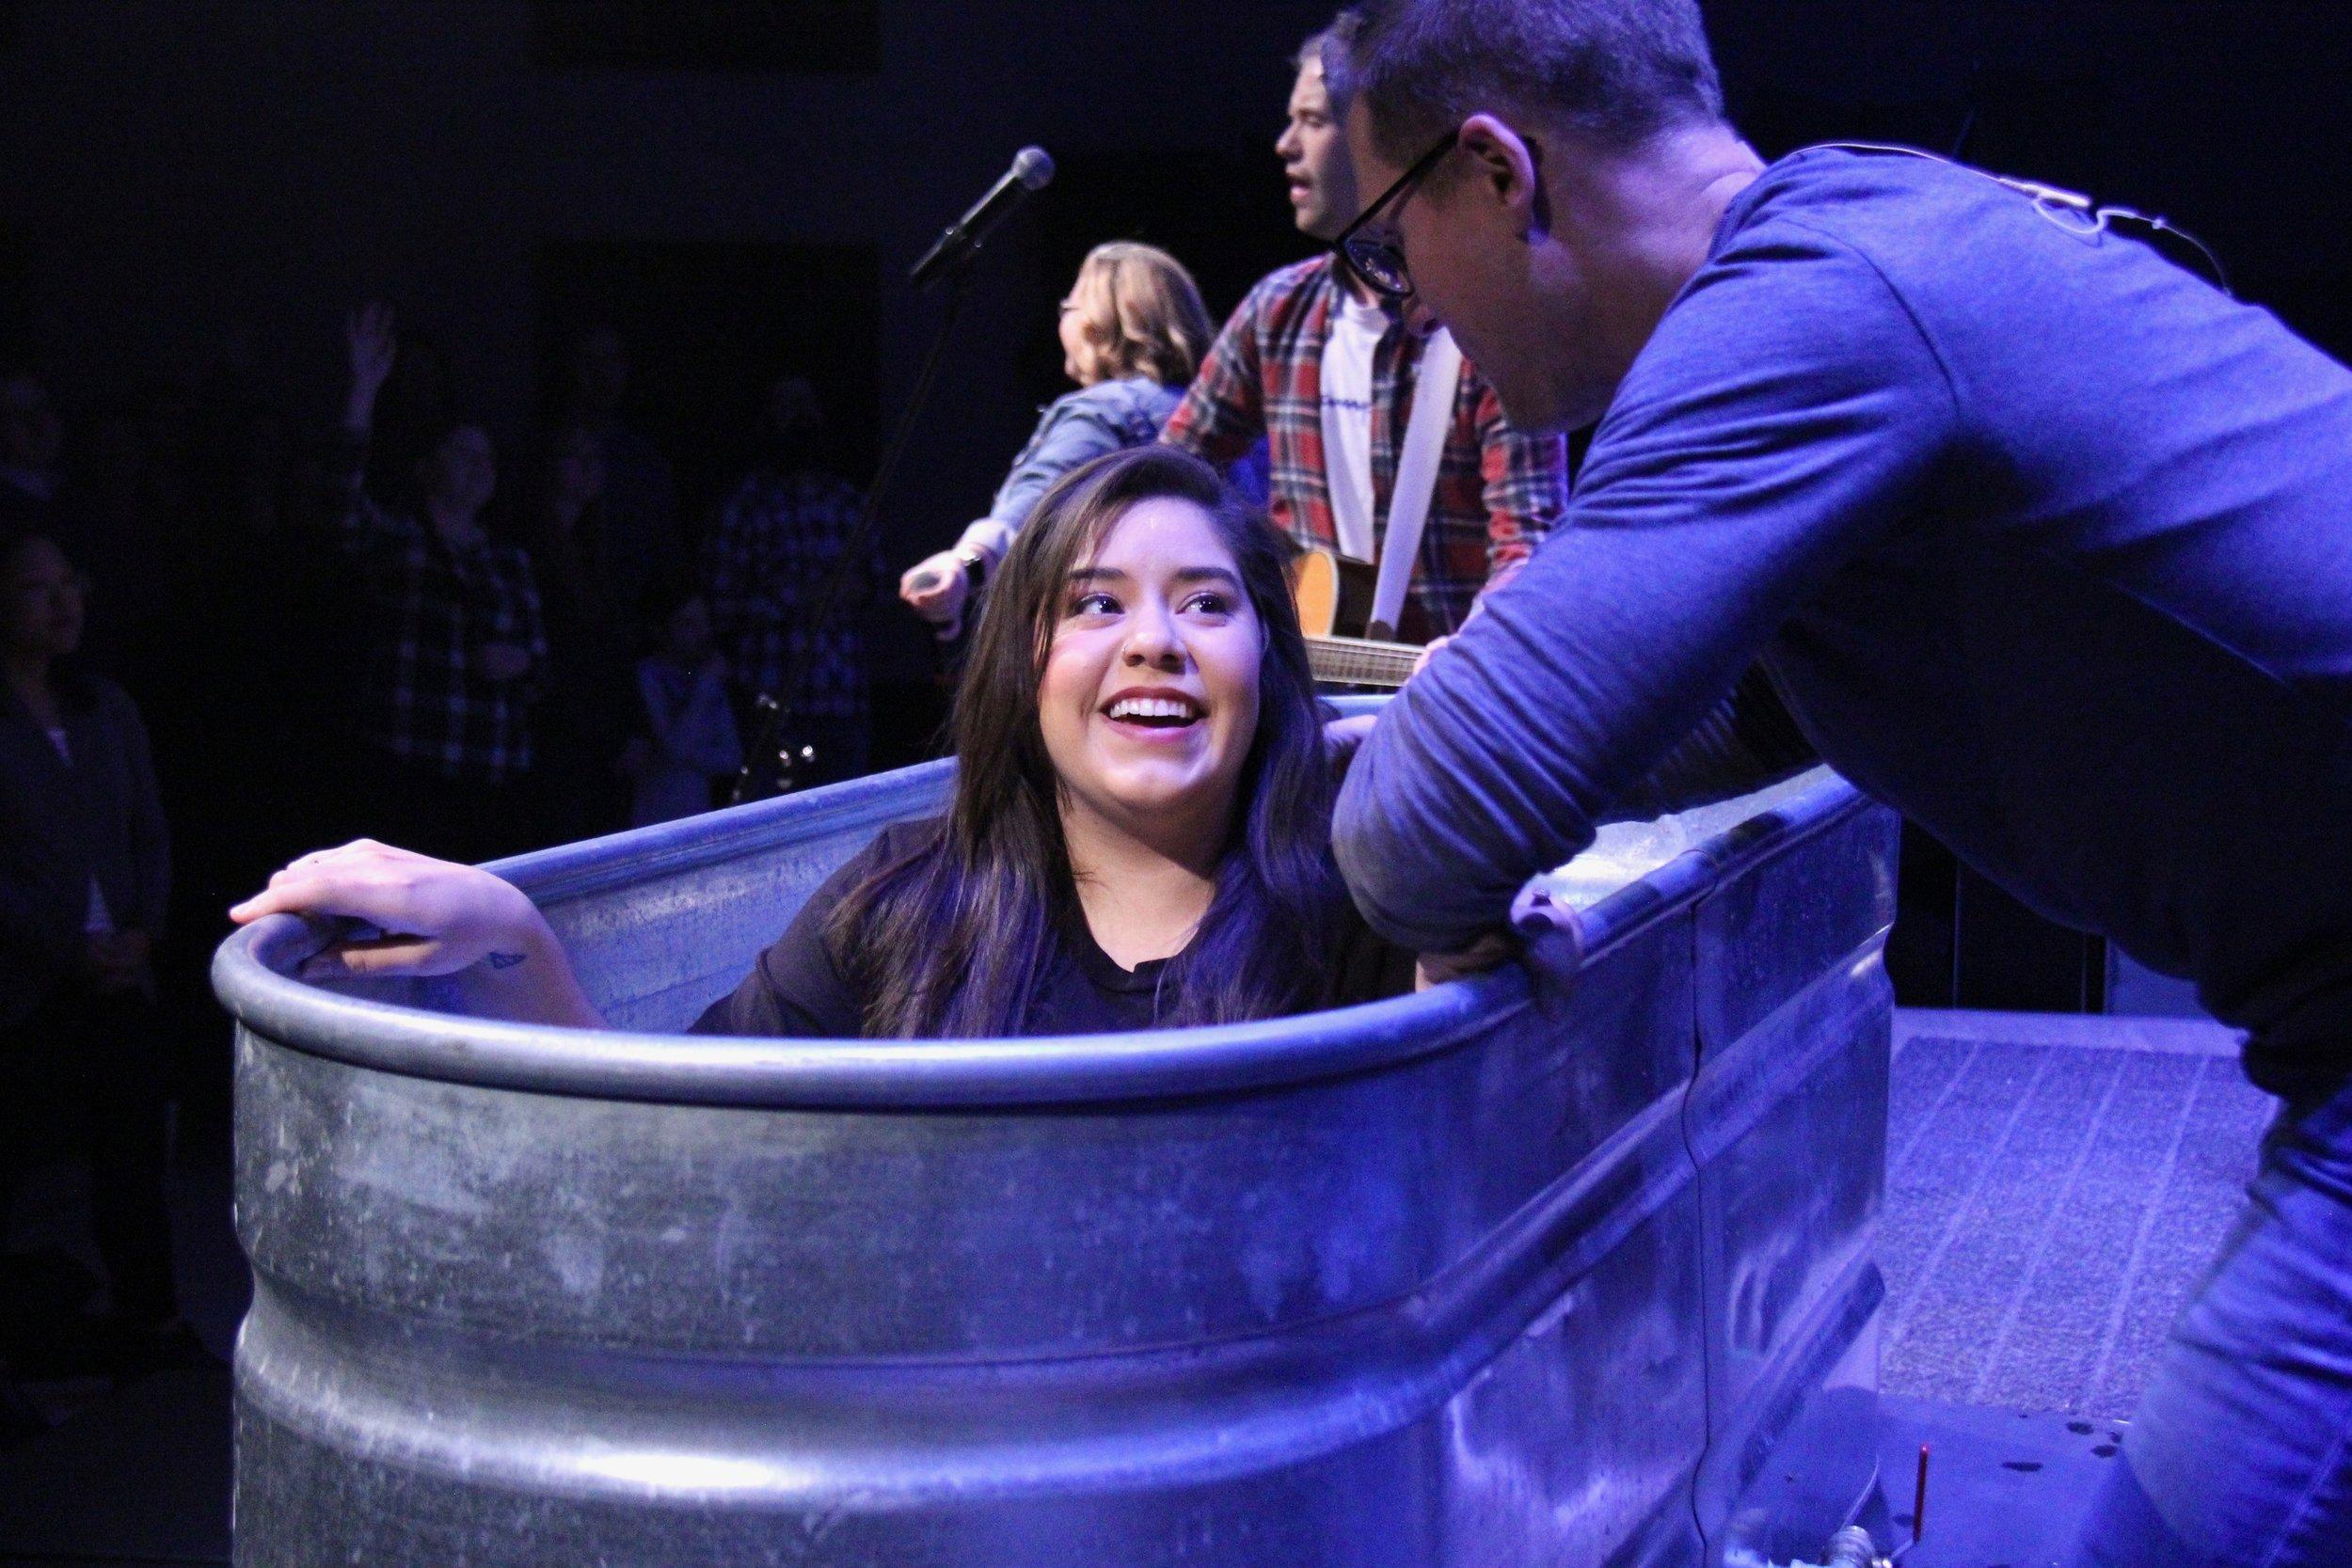 224baptism - 42.jpg